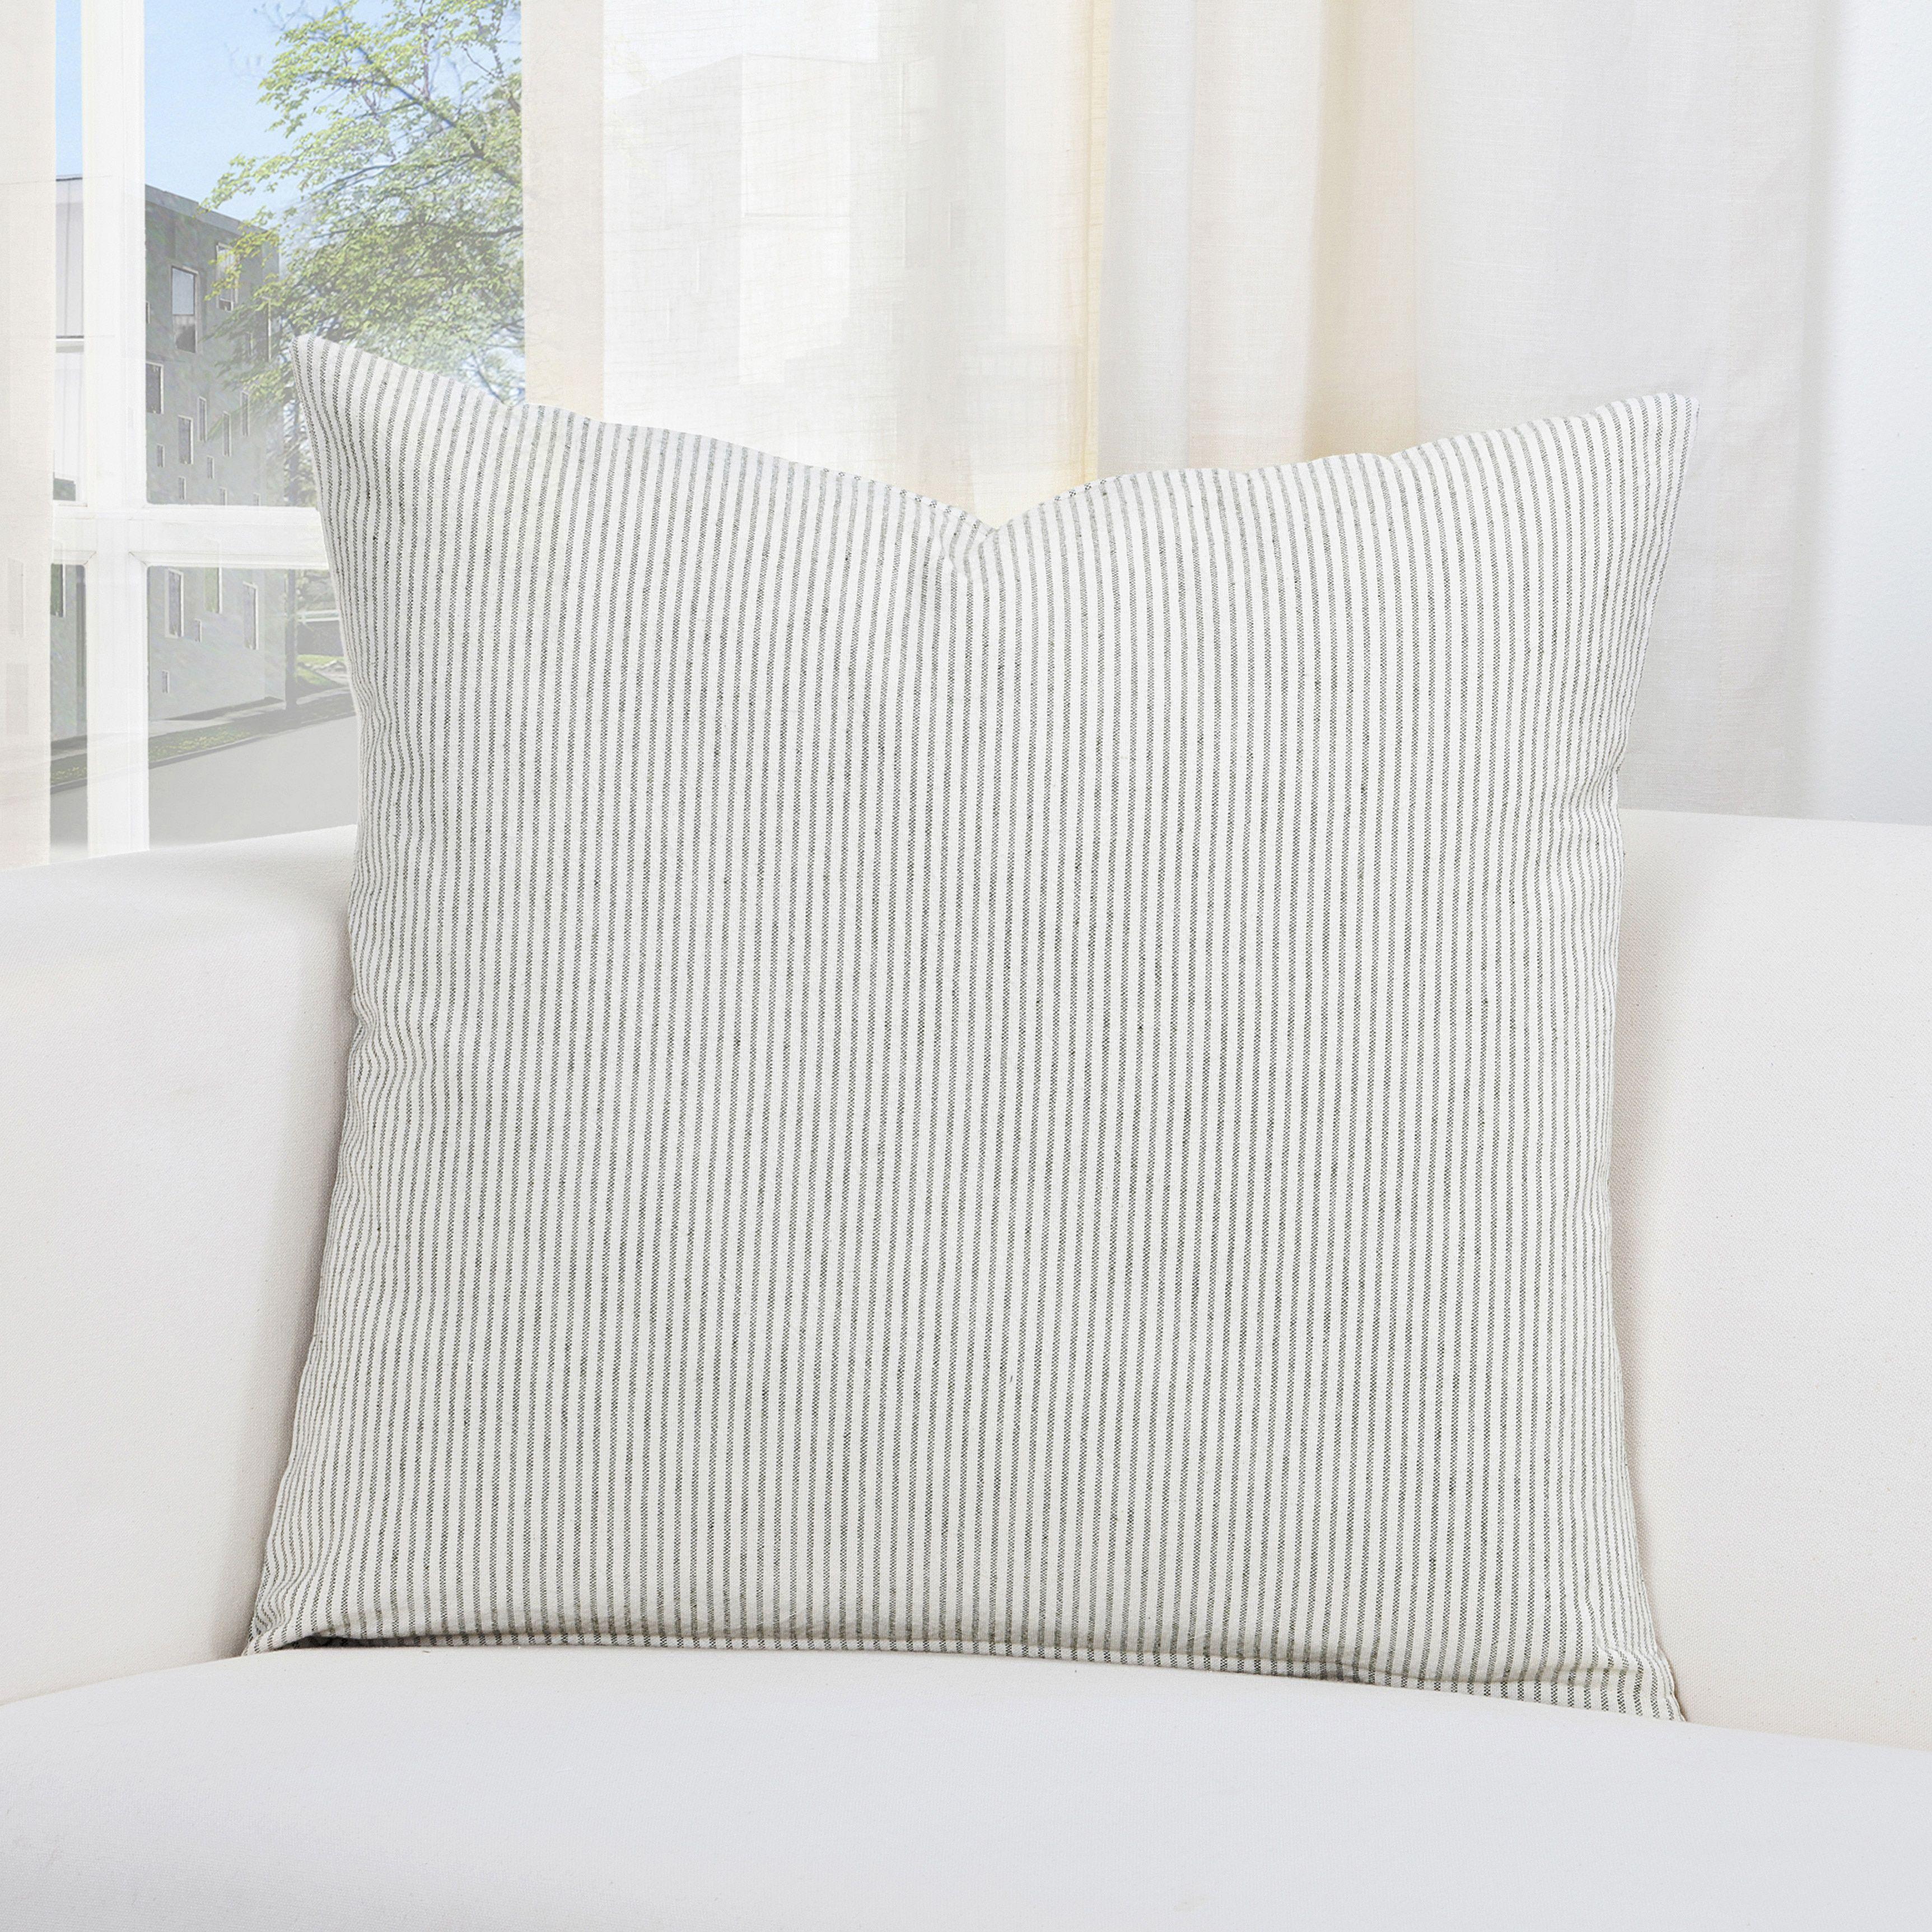 Pillow Shams 20 x 26 Ticking Stripe